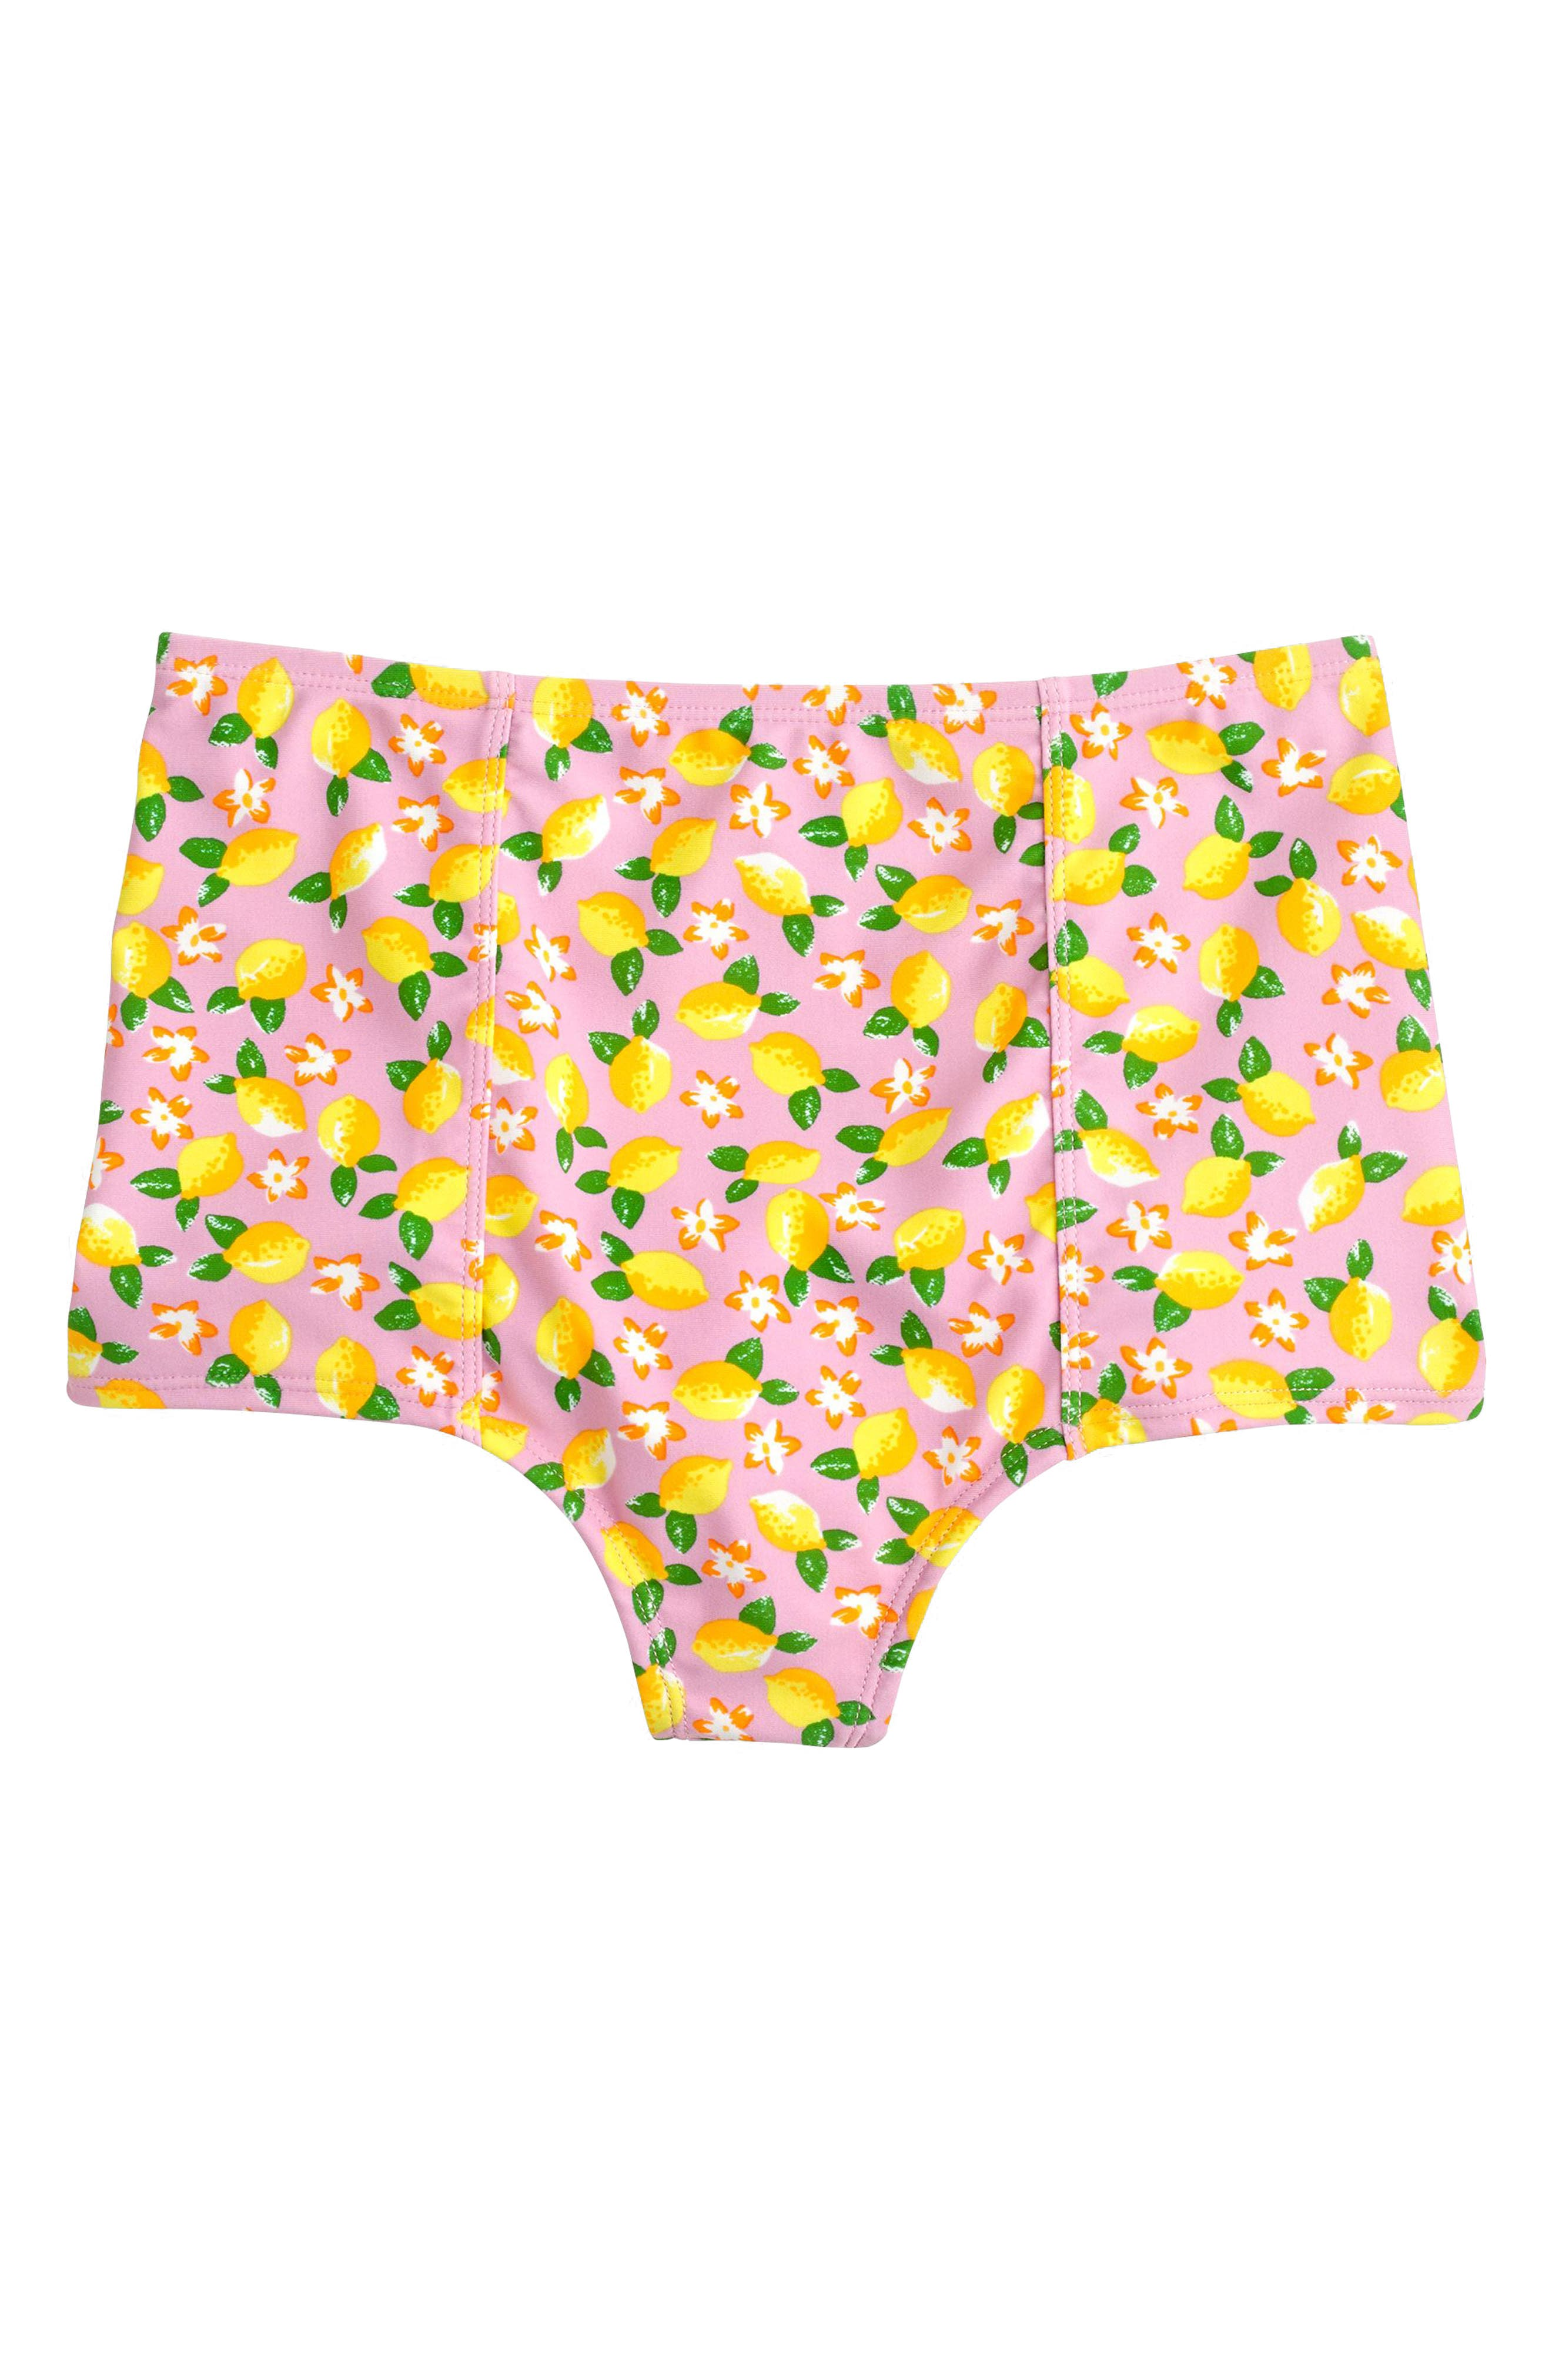 Lemon Print High Waist Bikini Bottoms,                             Alternate thumbnail 3, color,                             Lemon Multi